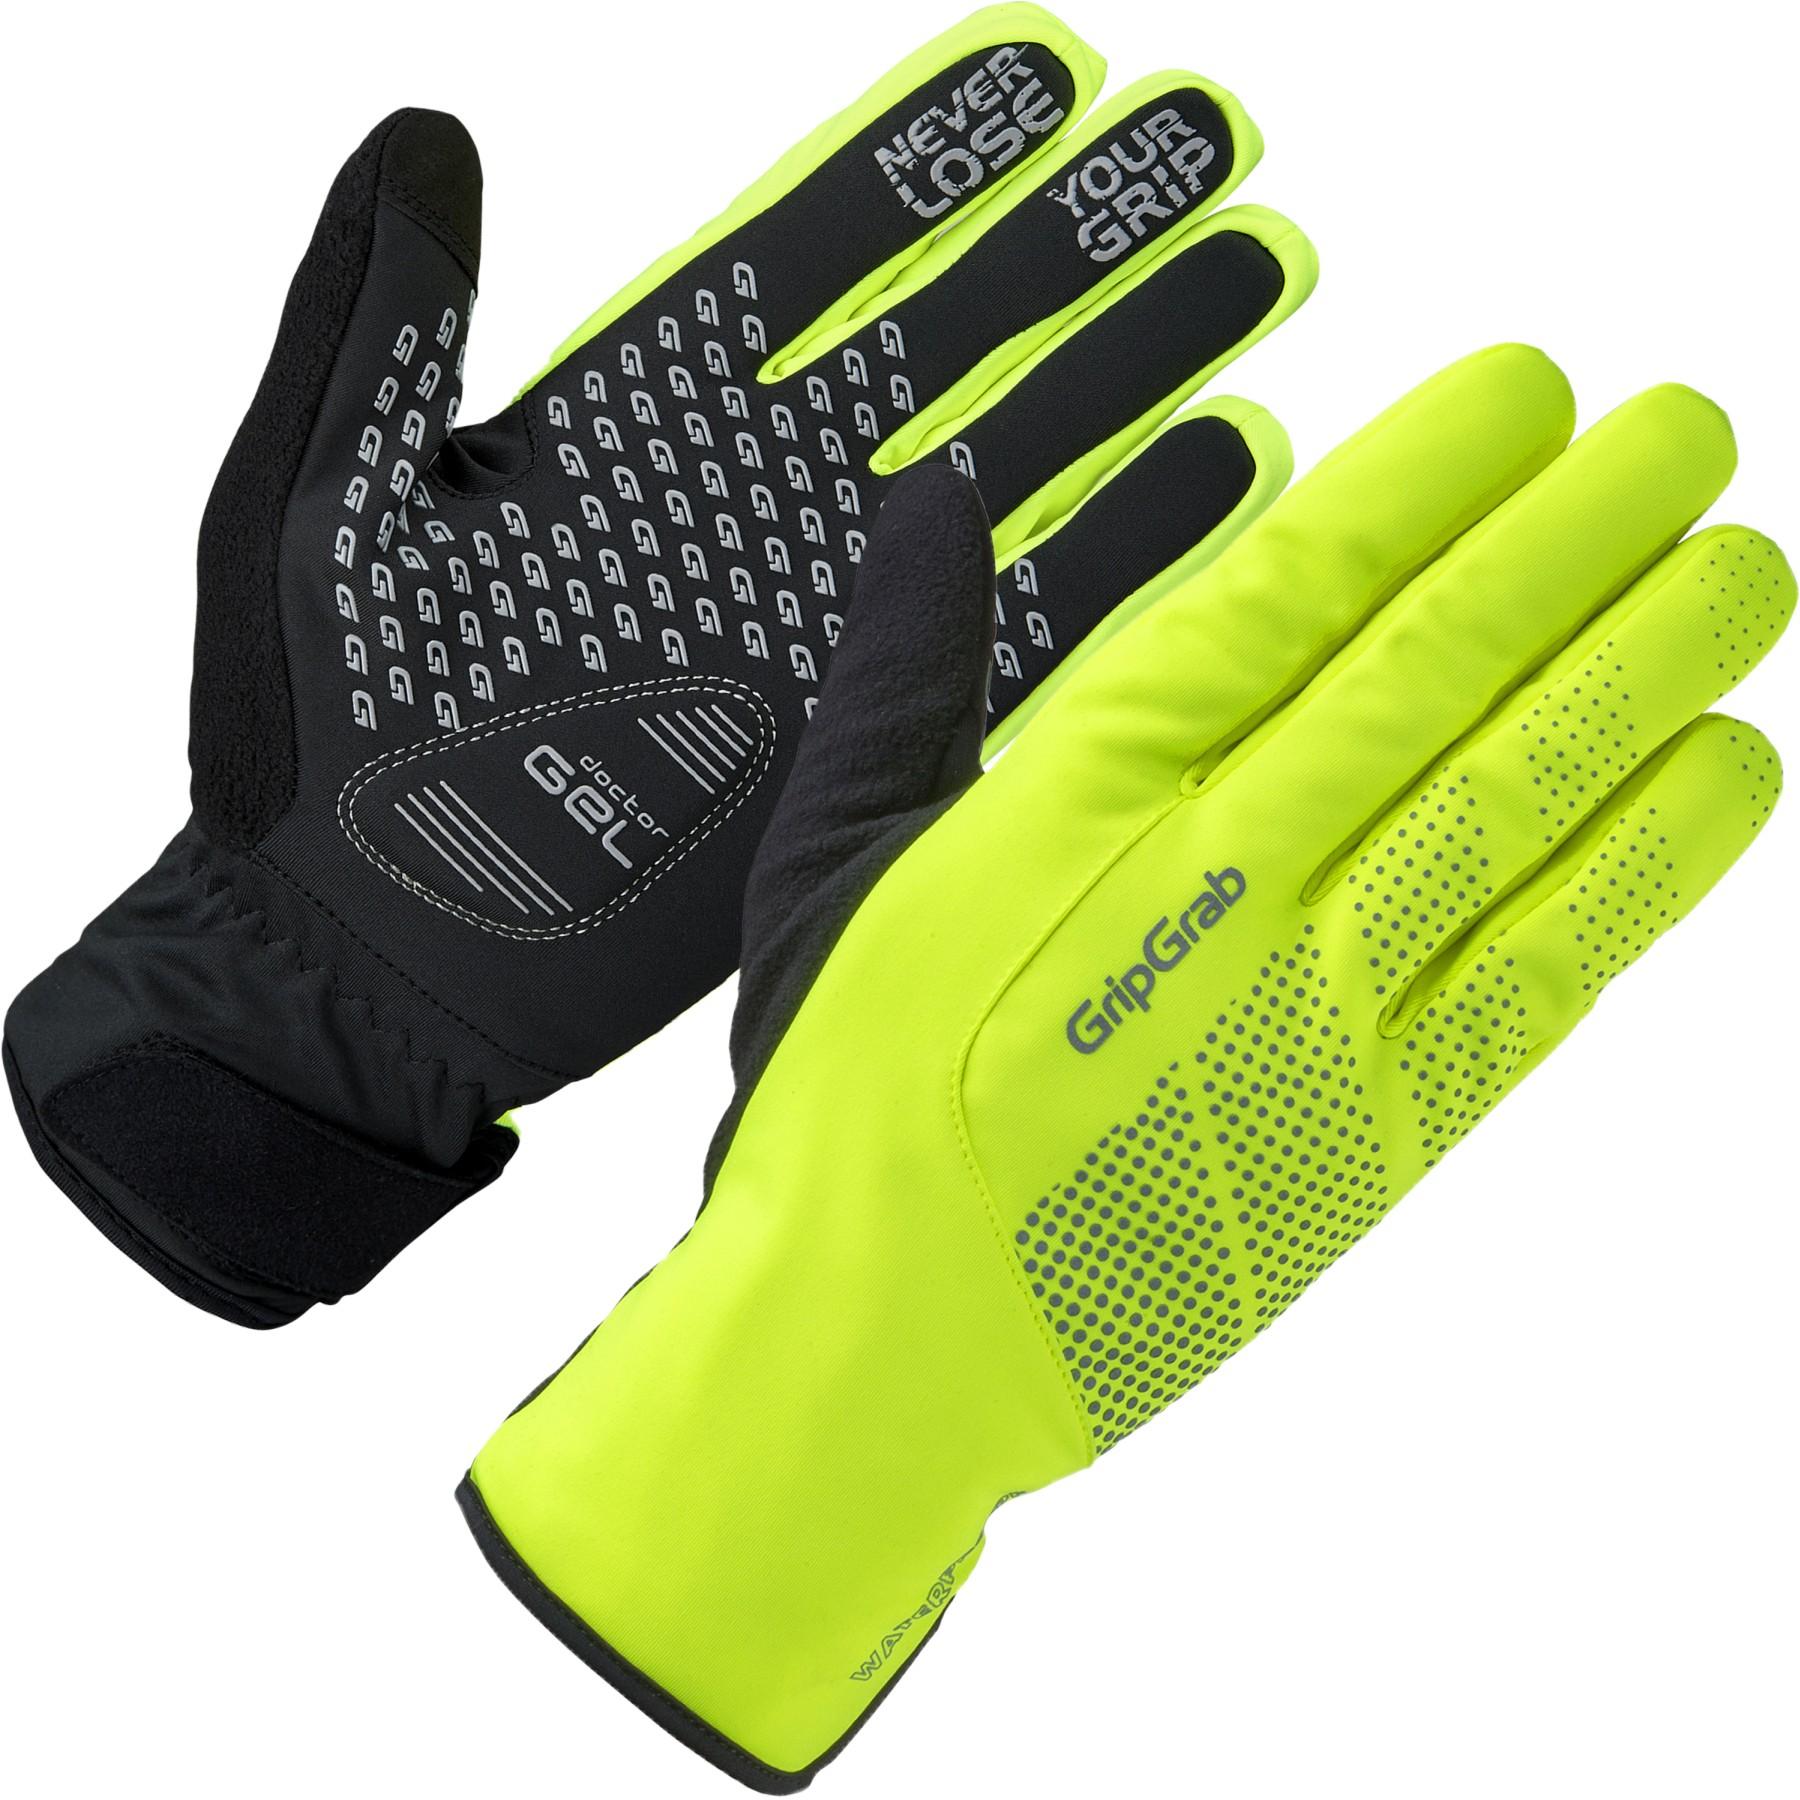 GripGrab Ride Hi-Vis Wasserdichter Winter Handschuh - Yellow Hi-Vis